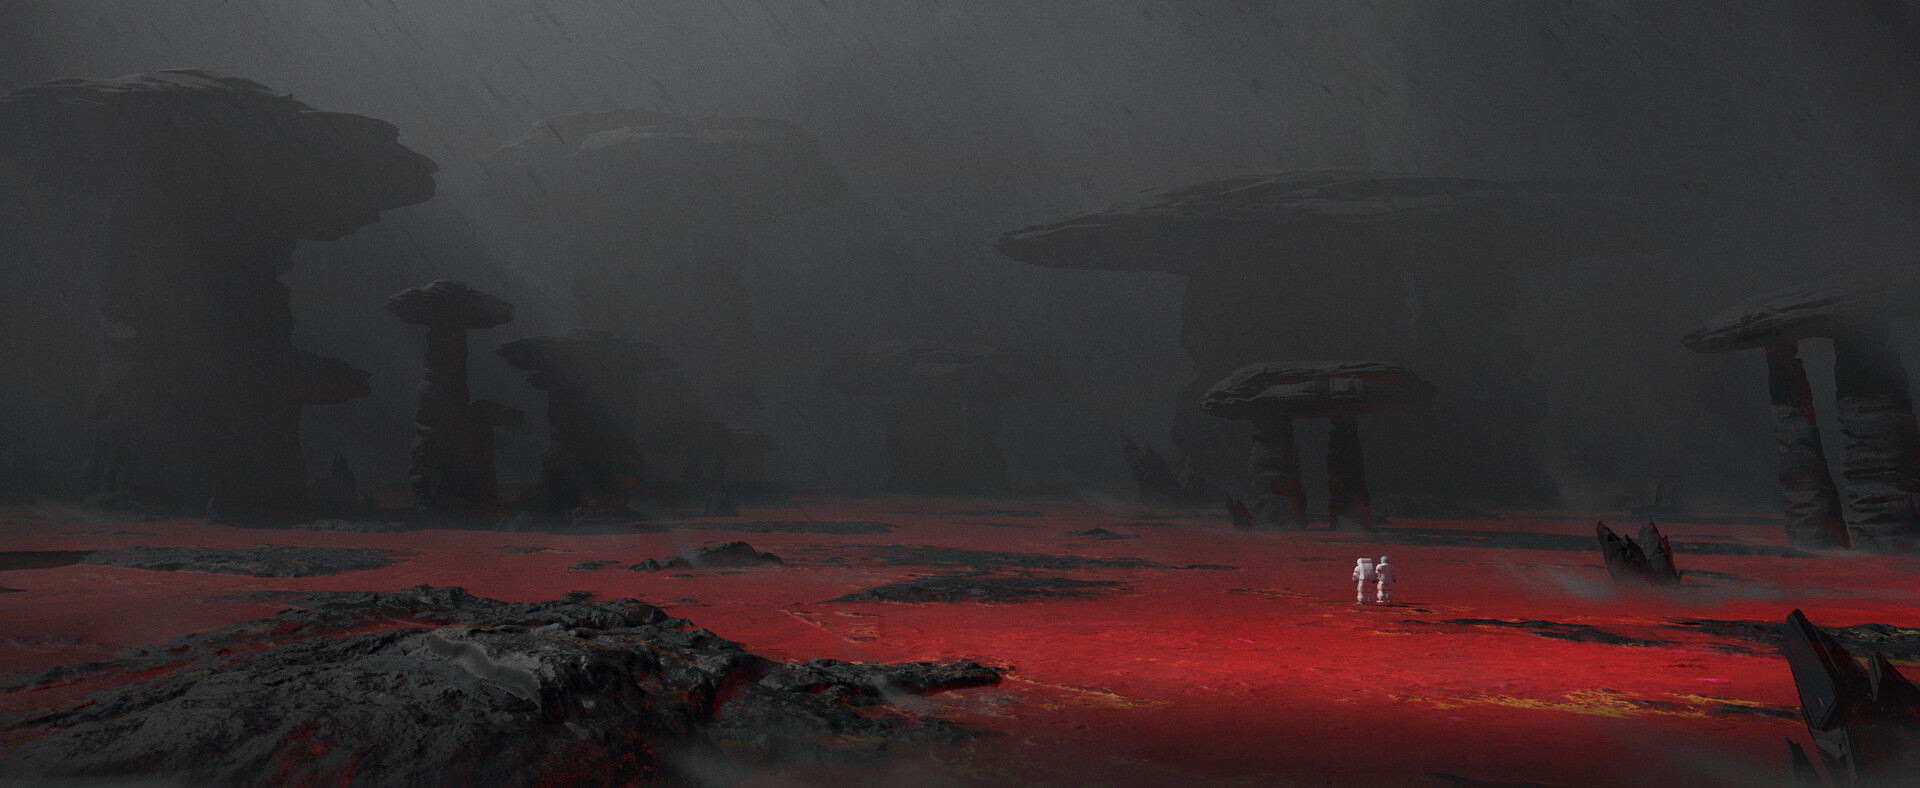 Sathish kumar alienplanet 01